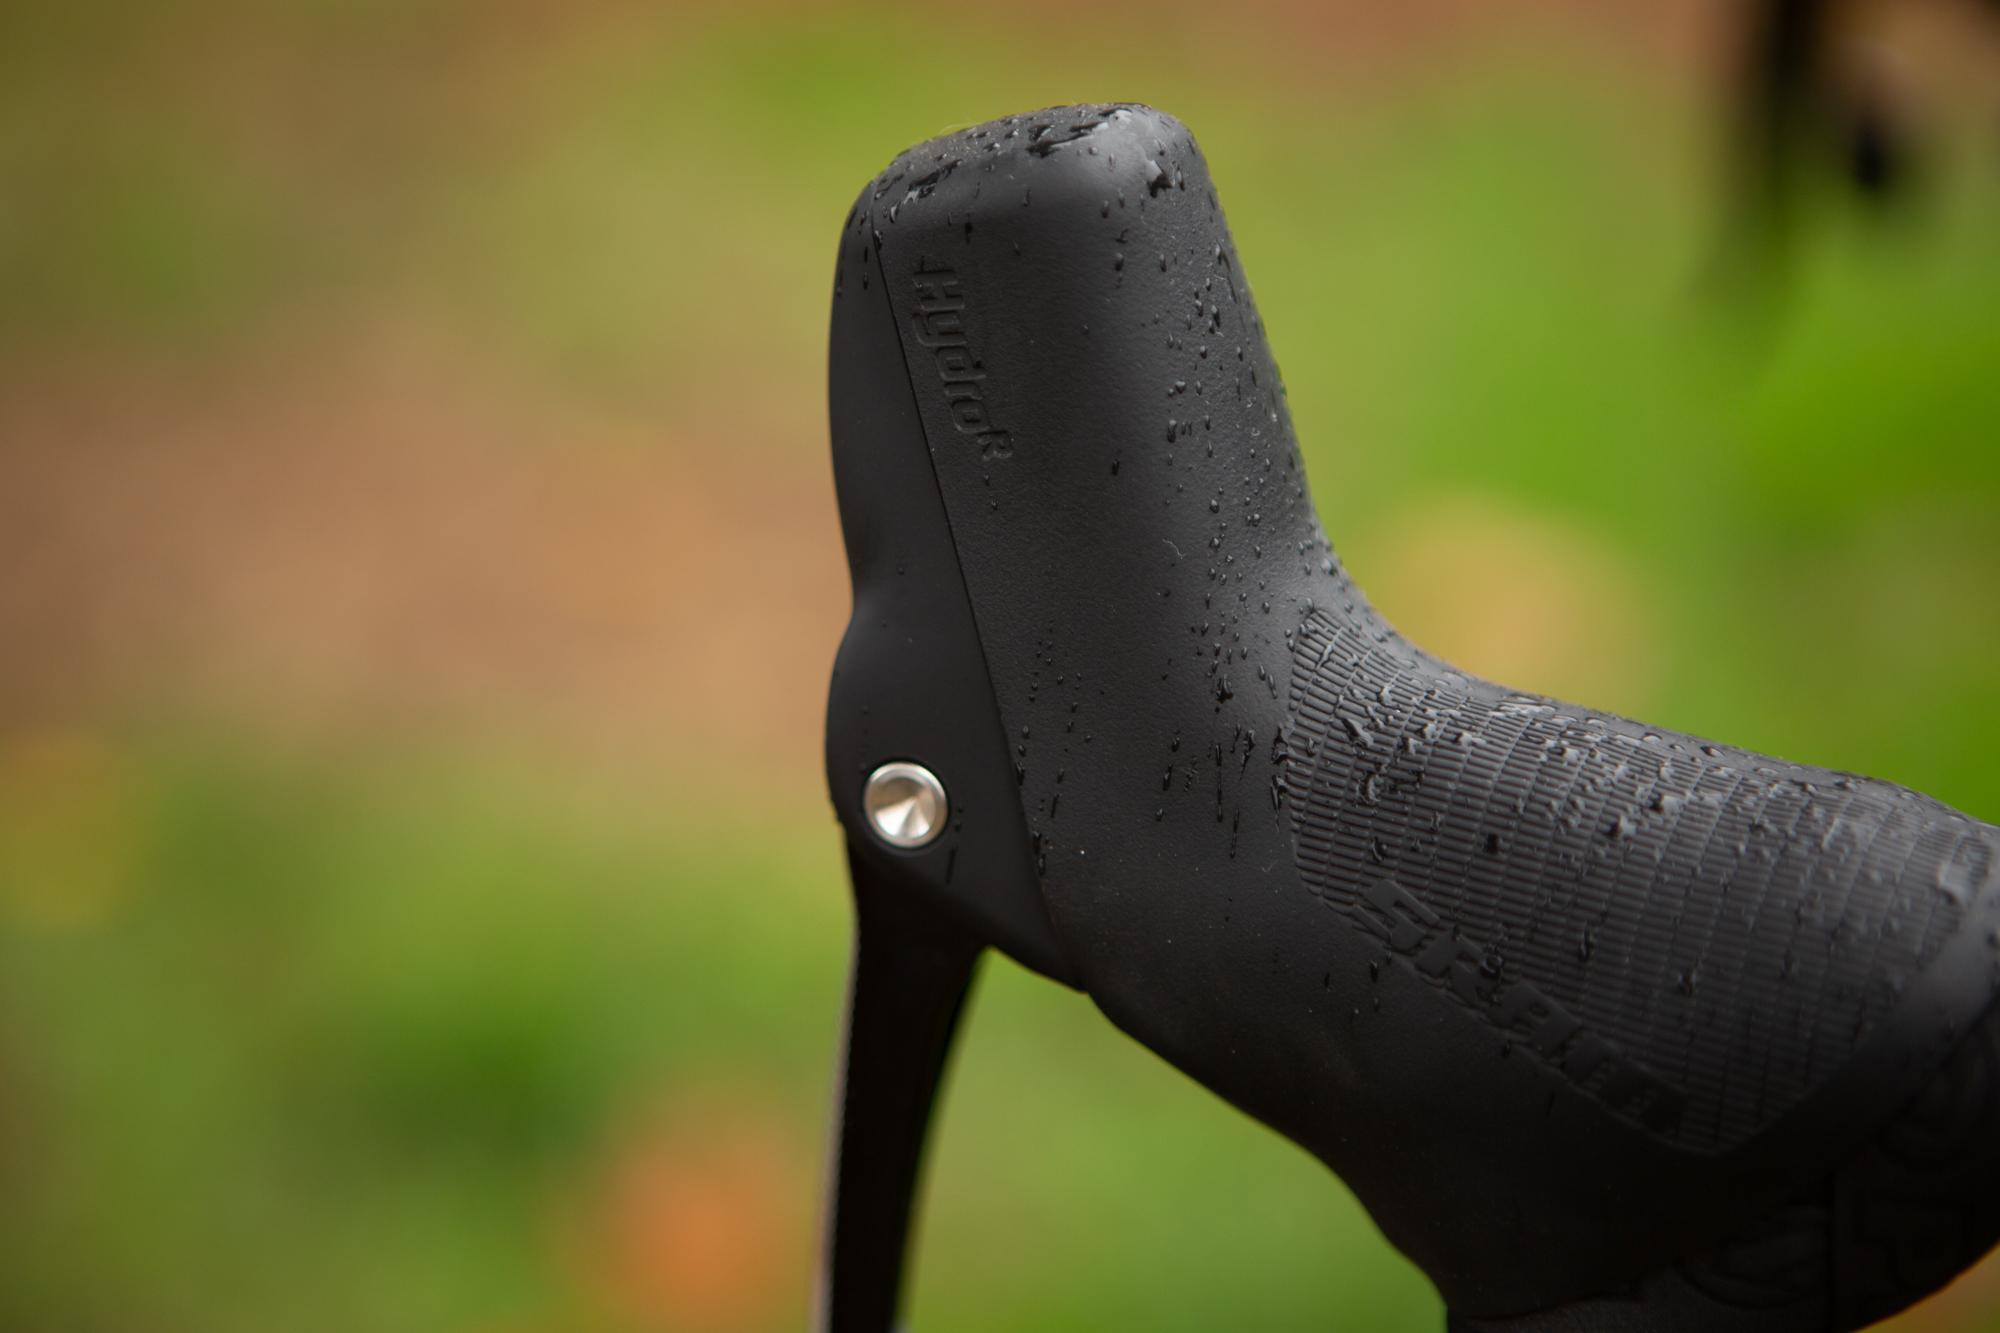 SRAM Rival 1 hydraulic brake and shifter lever